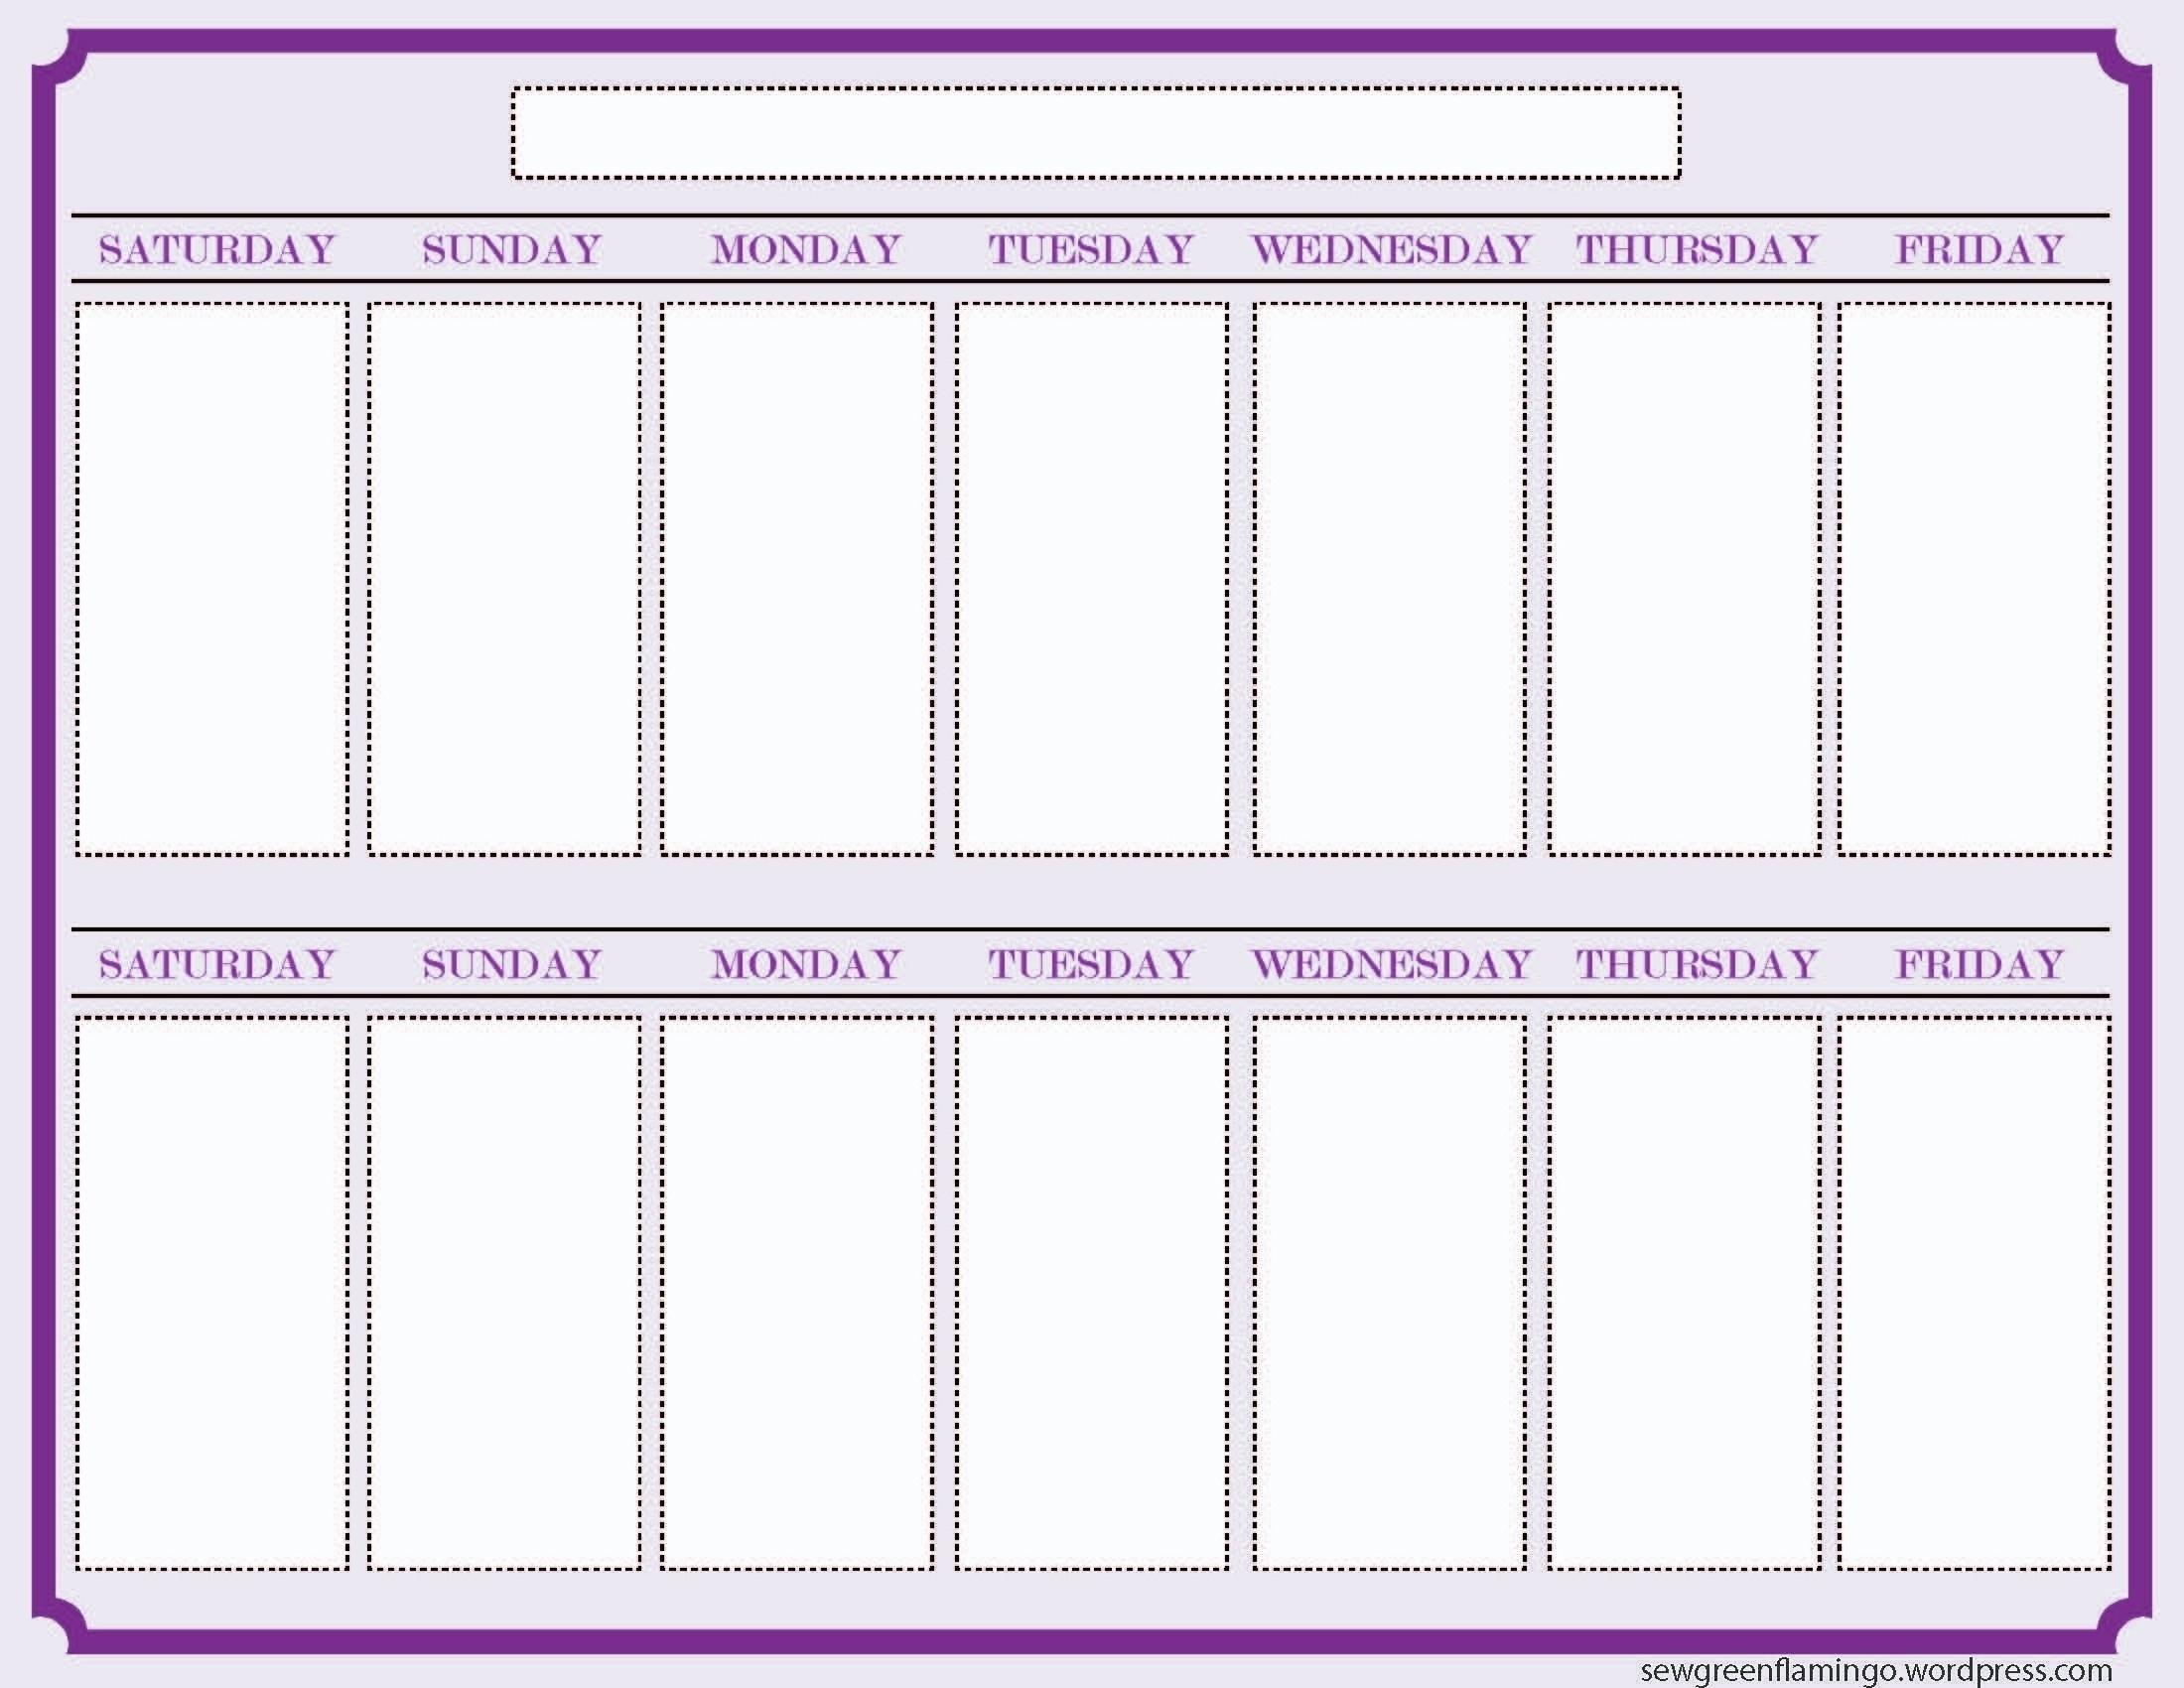 Blank Two Week Calendar Print Free E Printable Schedule   Smorad with regard to Print A Two Week Calendar